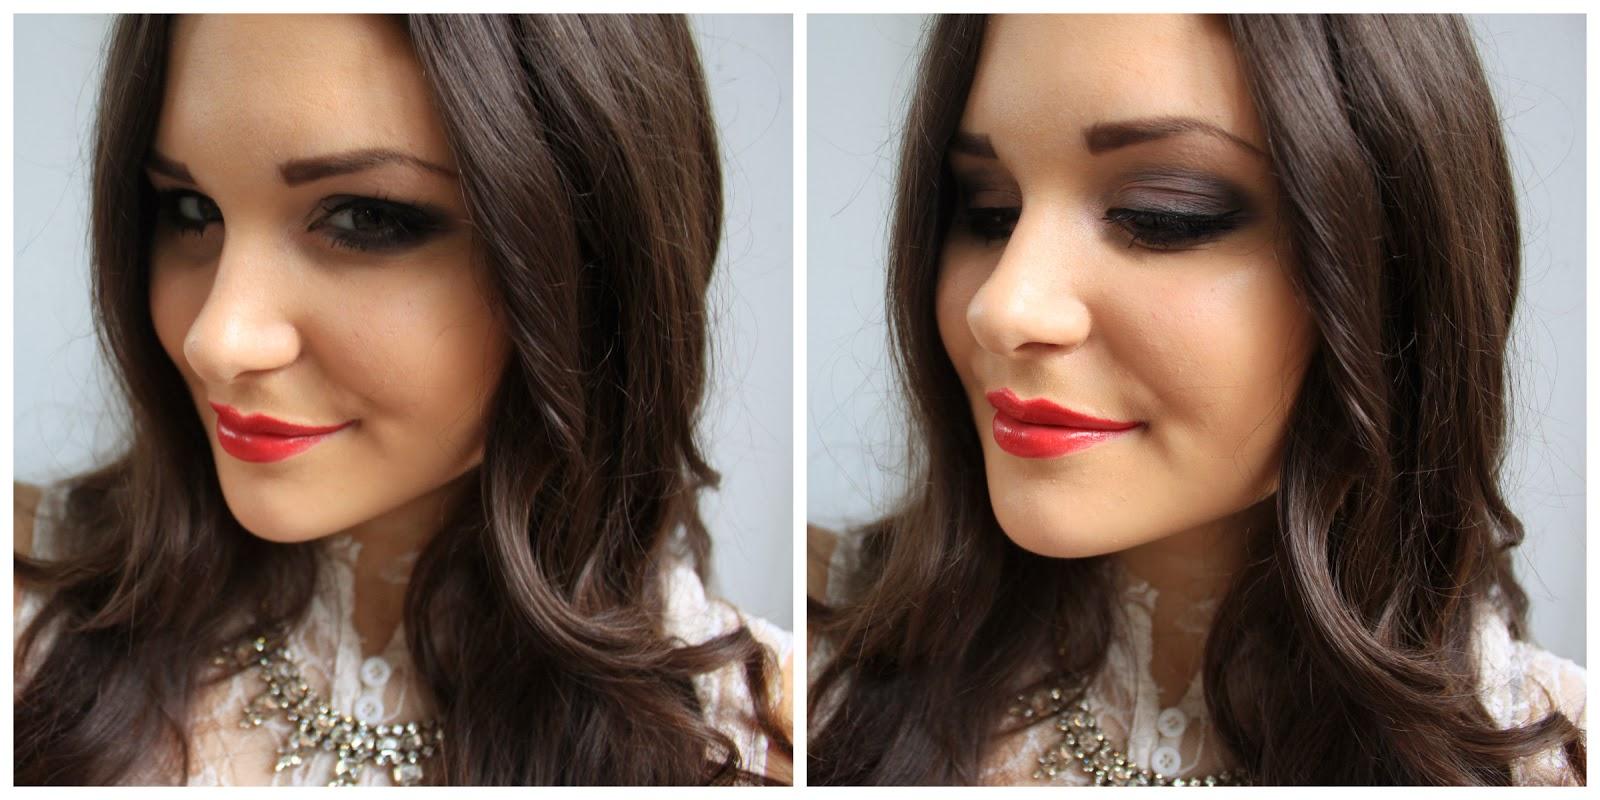 Beauty blogger Mash Elle shares an easy daytime smokey eye using Urban Decay's Naked 3 palette